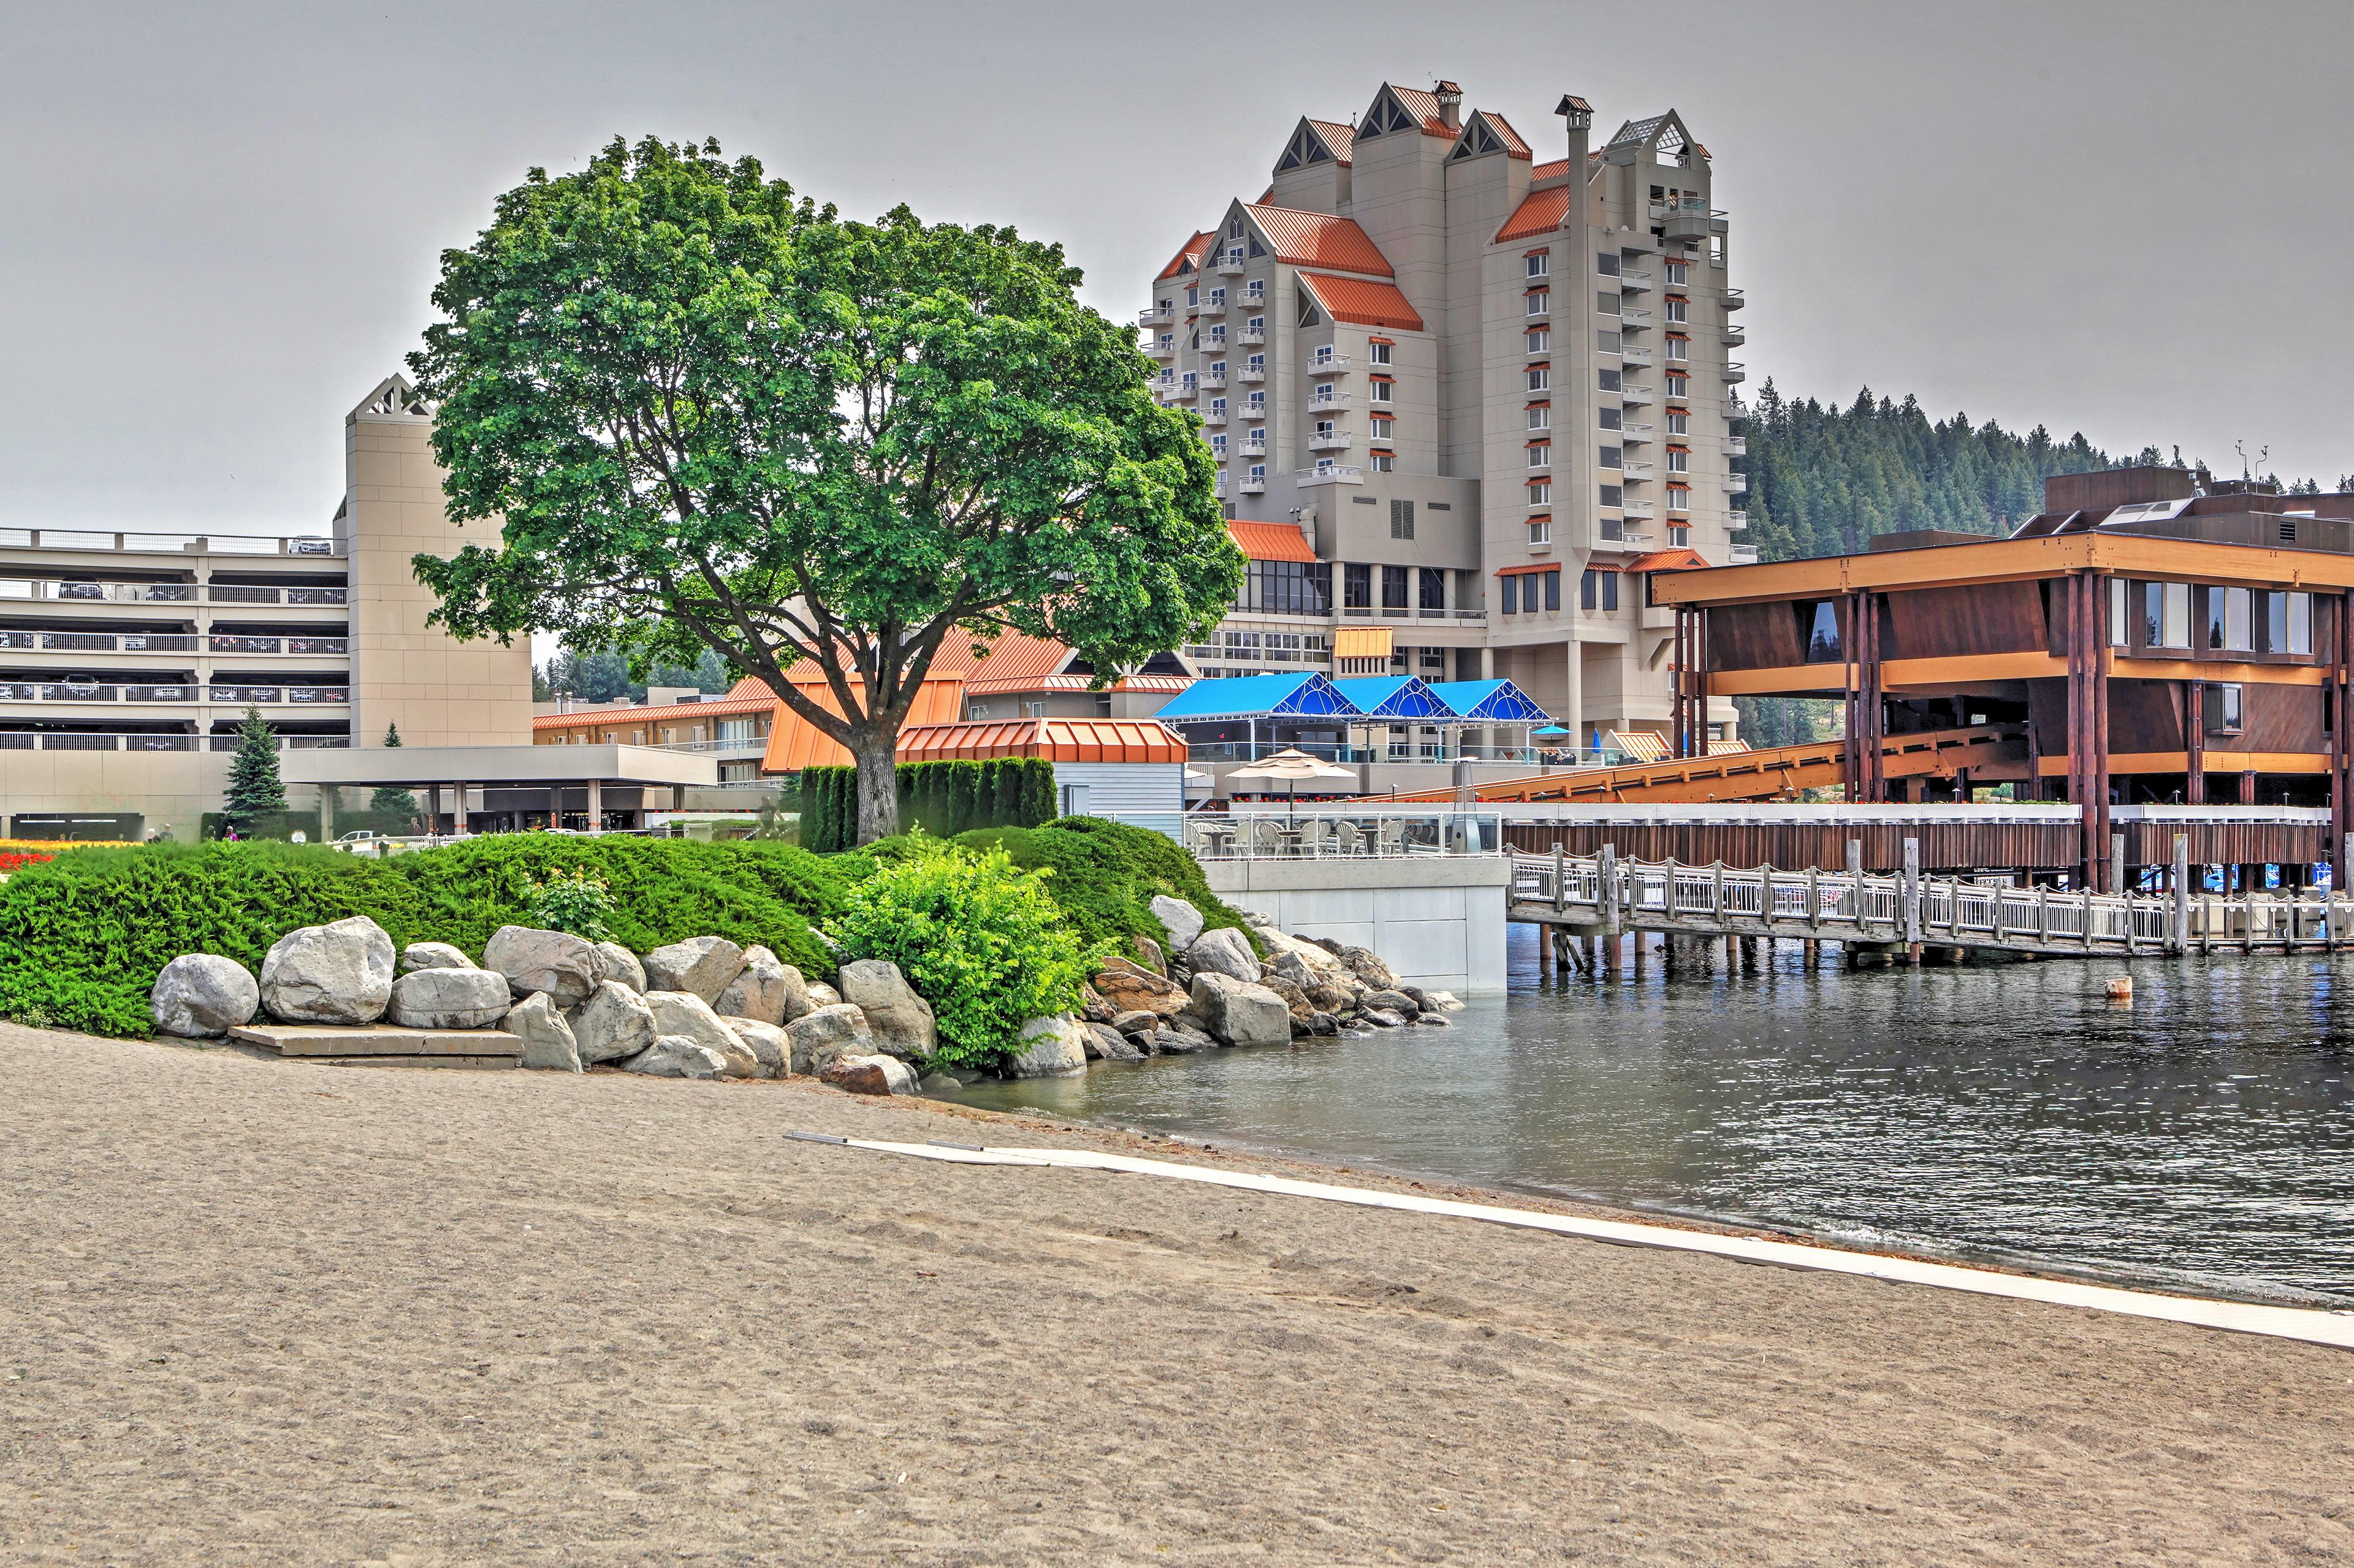 Stroll along the world's longest floating boardwalk at The Resort!